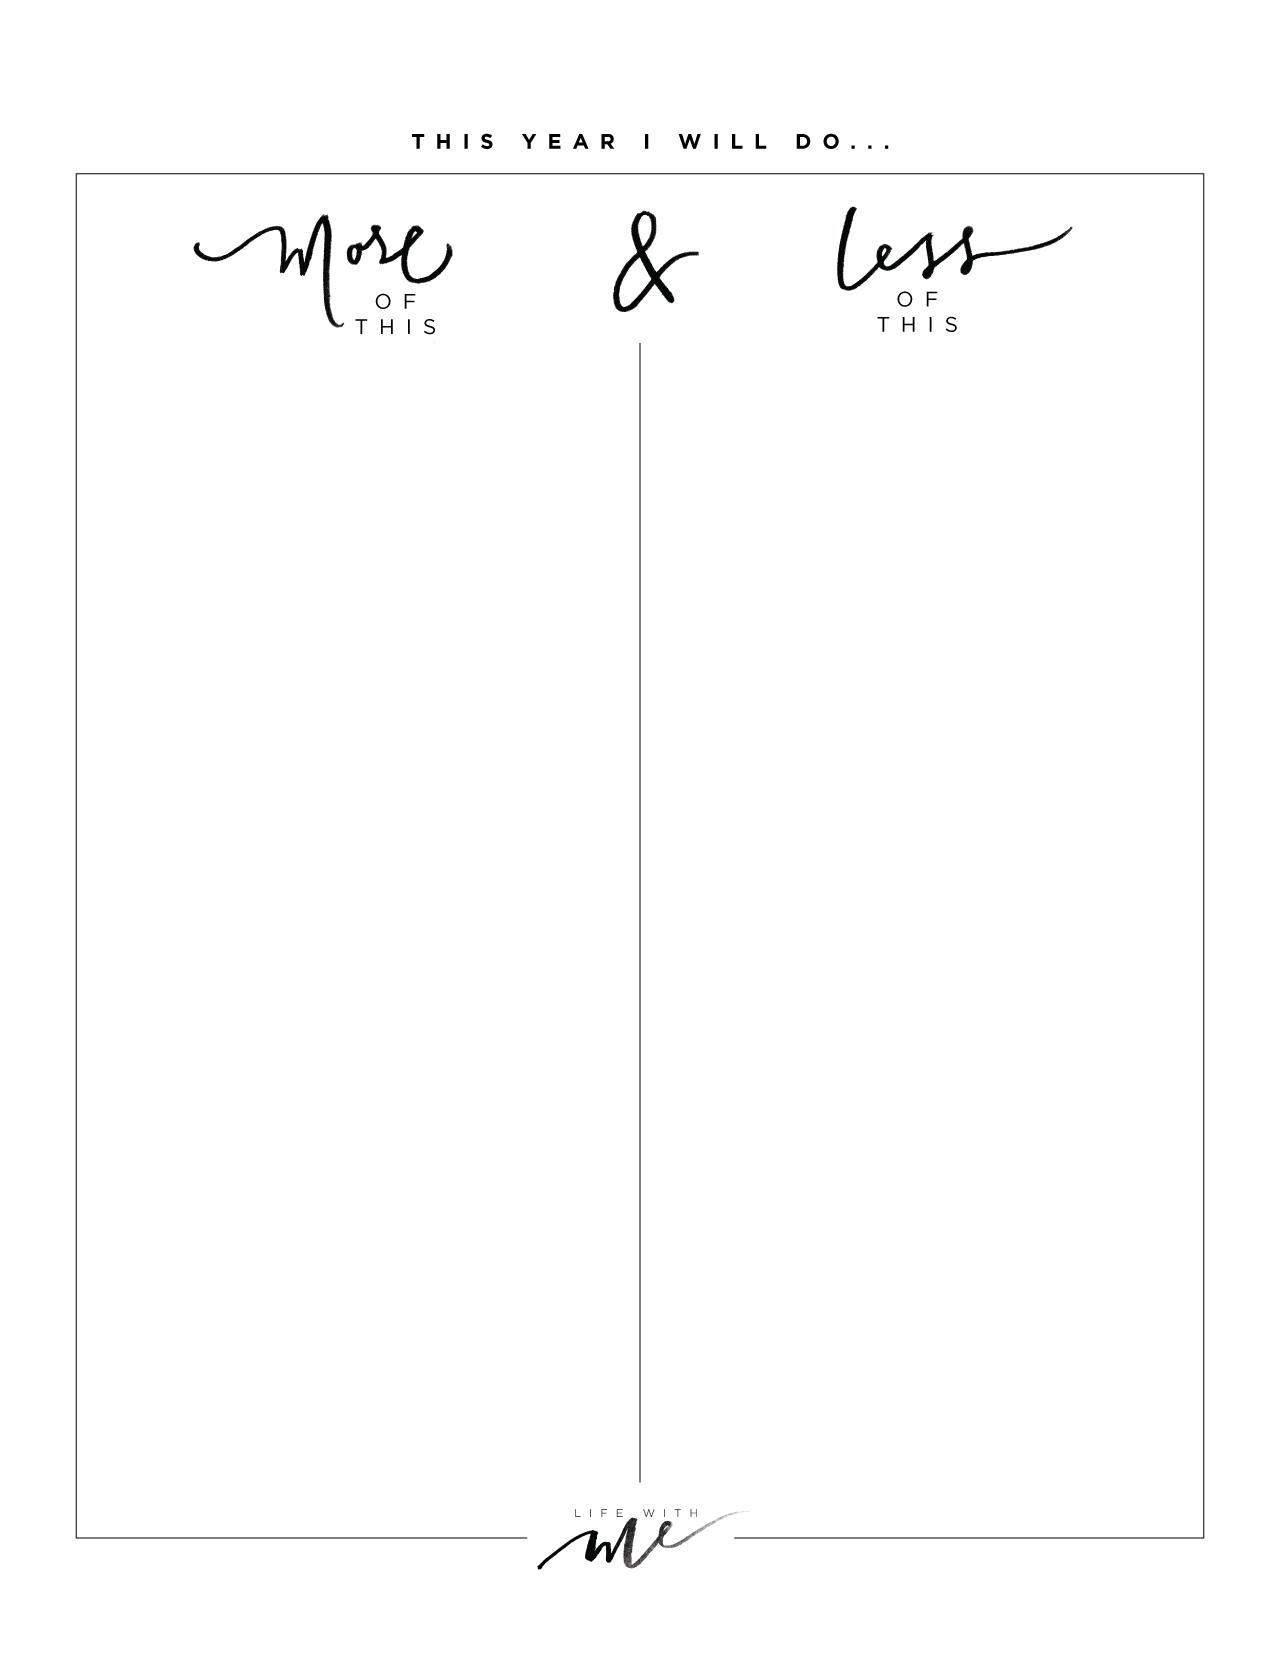 New Years Resolutions Printable Worksheets